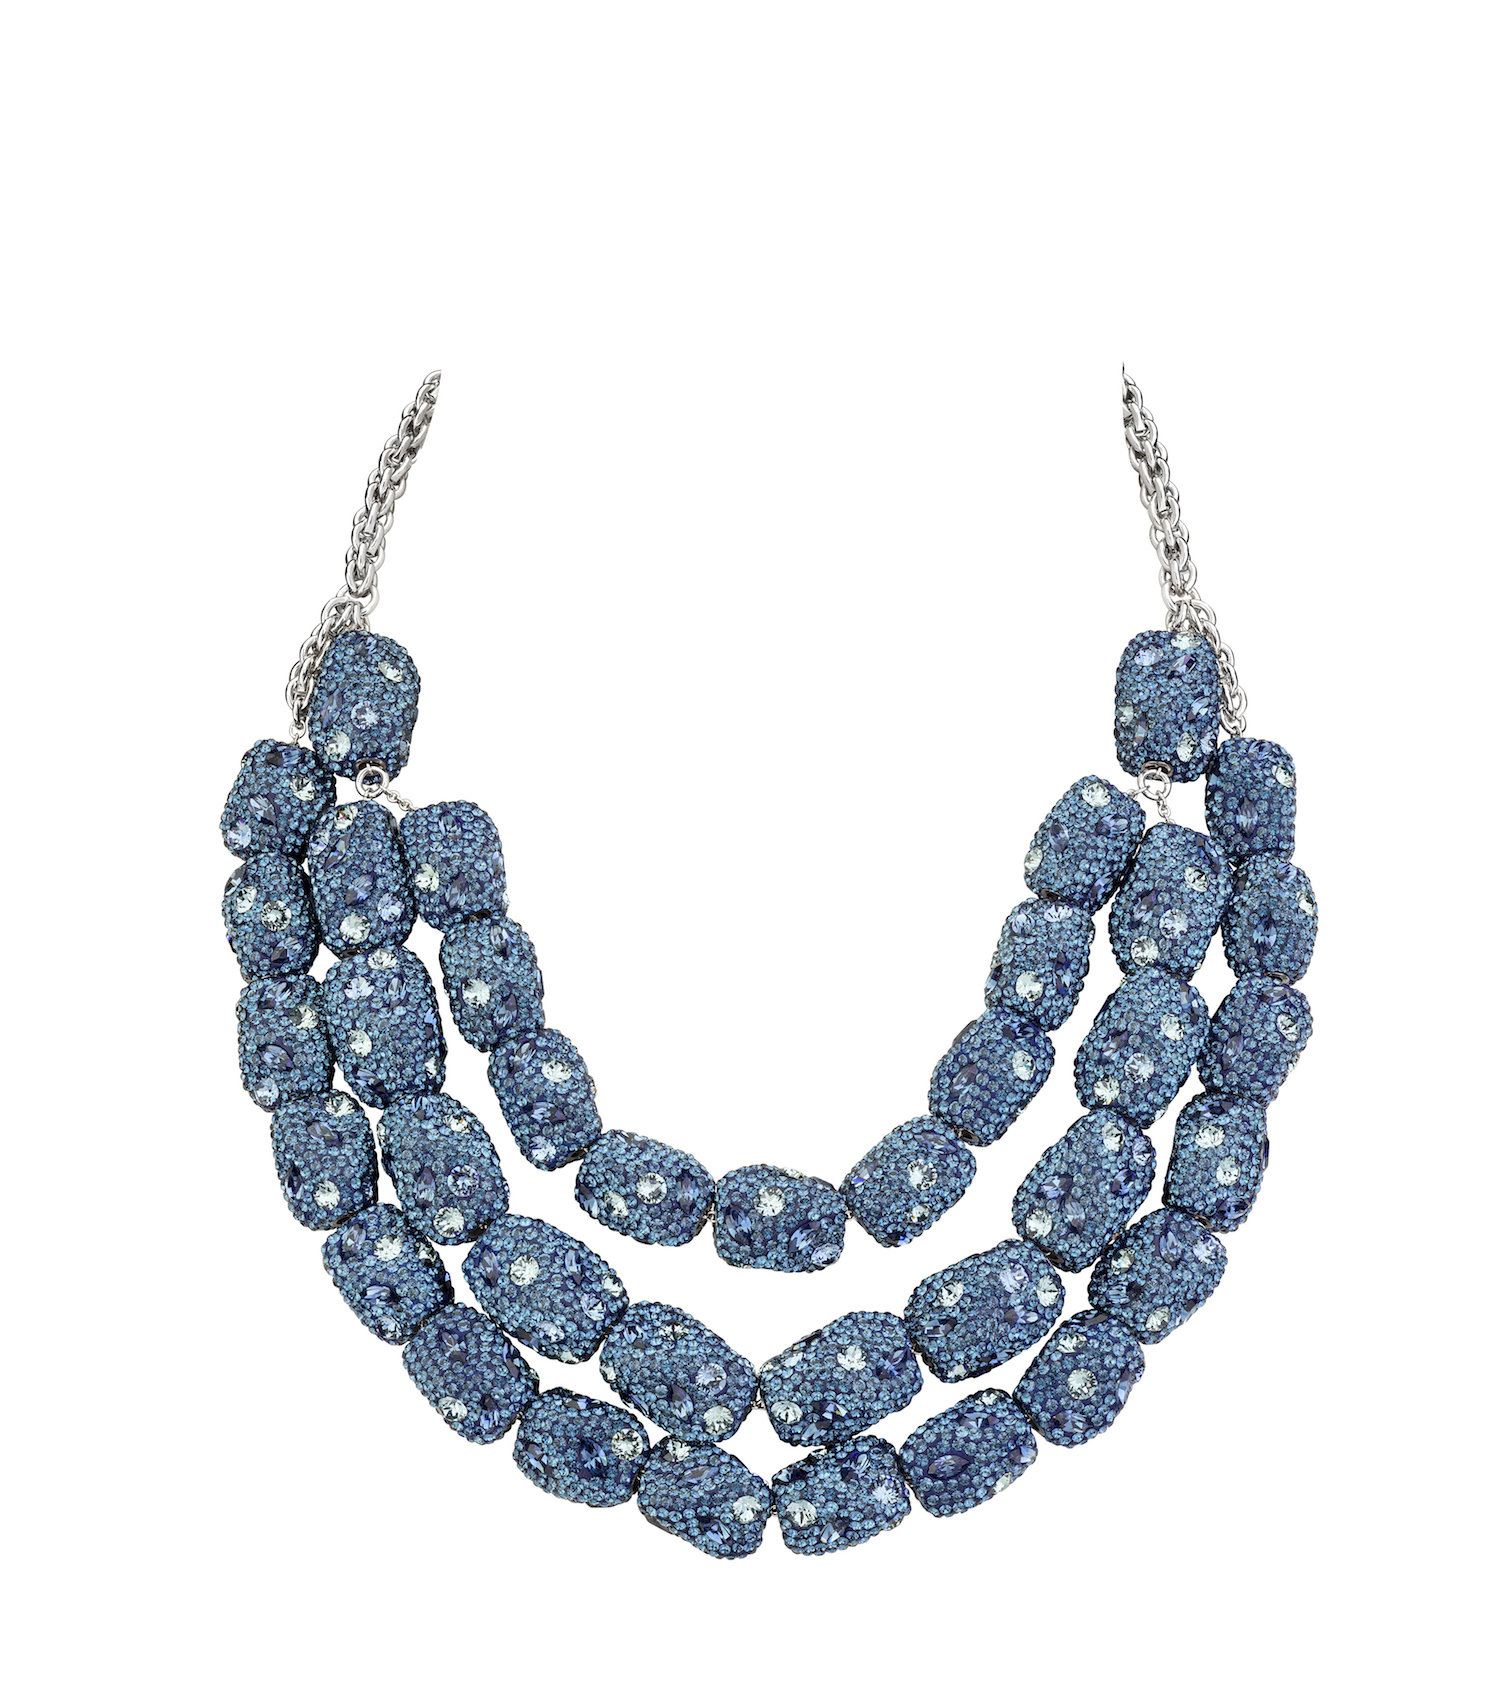 Atelier Swarovski Core Collection - Moselle neck piece